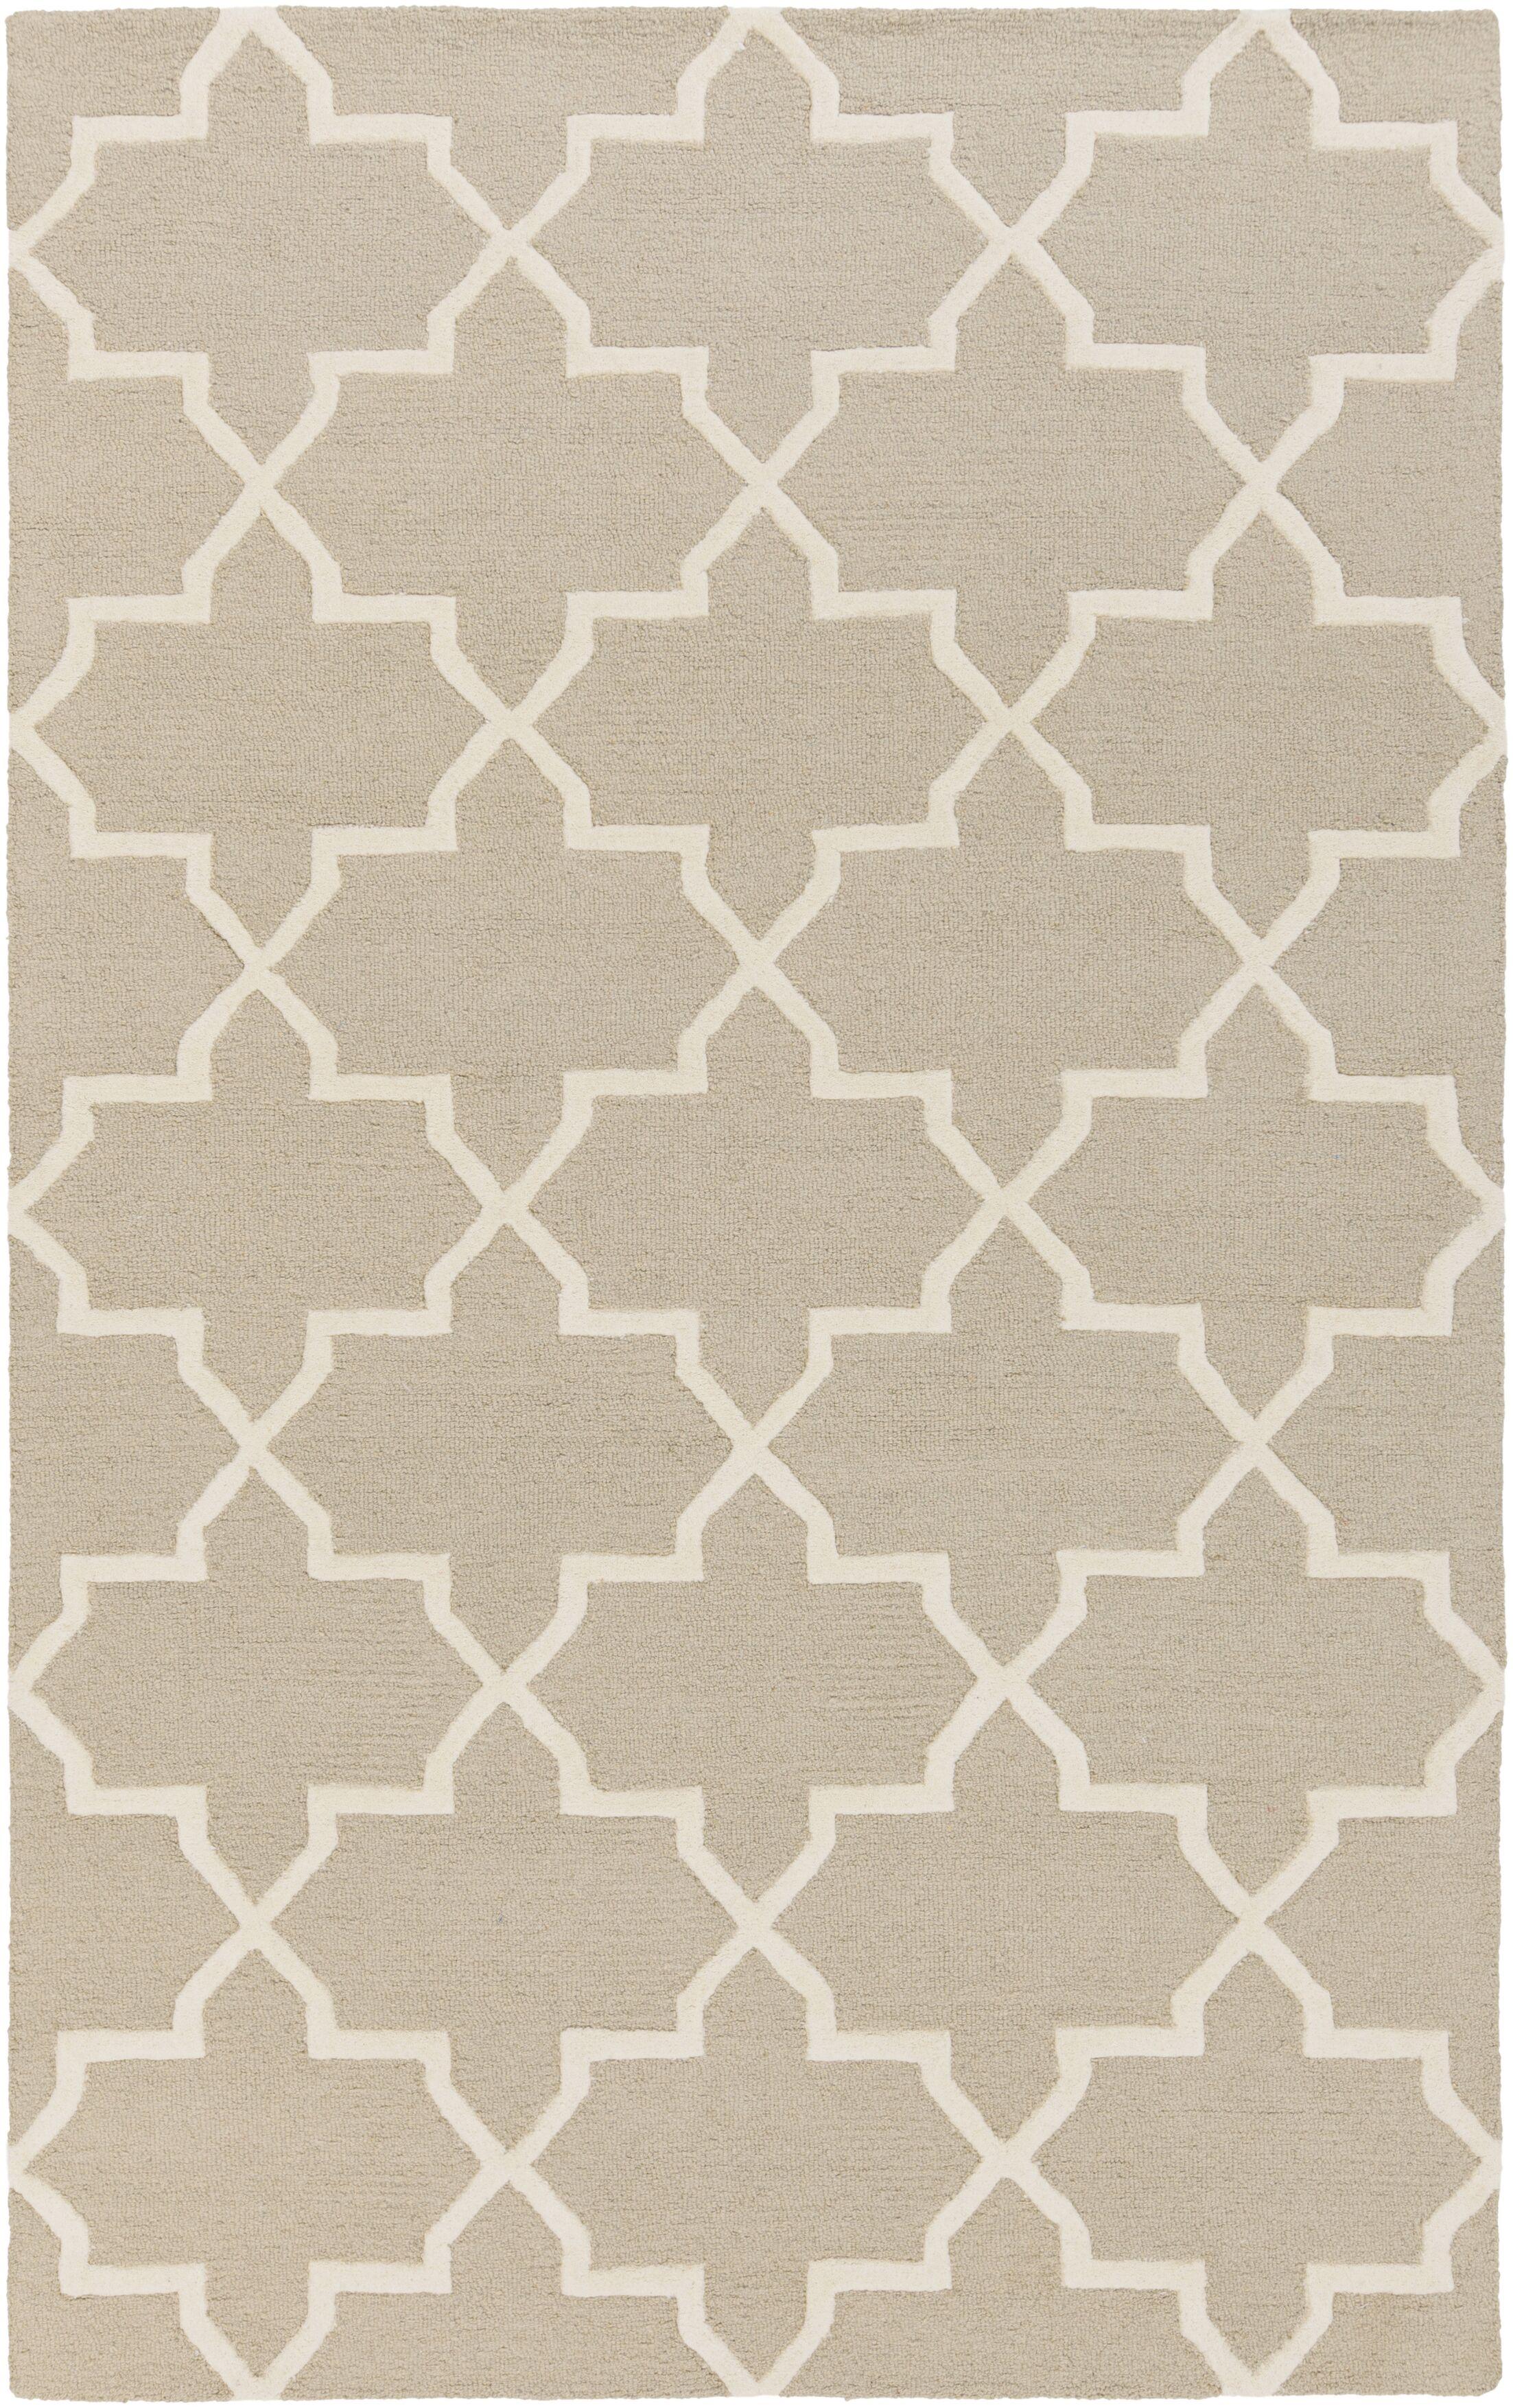 Blaisdell Beige Geometric Keely Area Rug Rug Size: Rectangle 6' x 9'